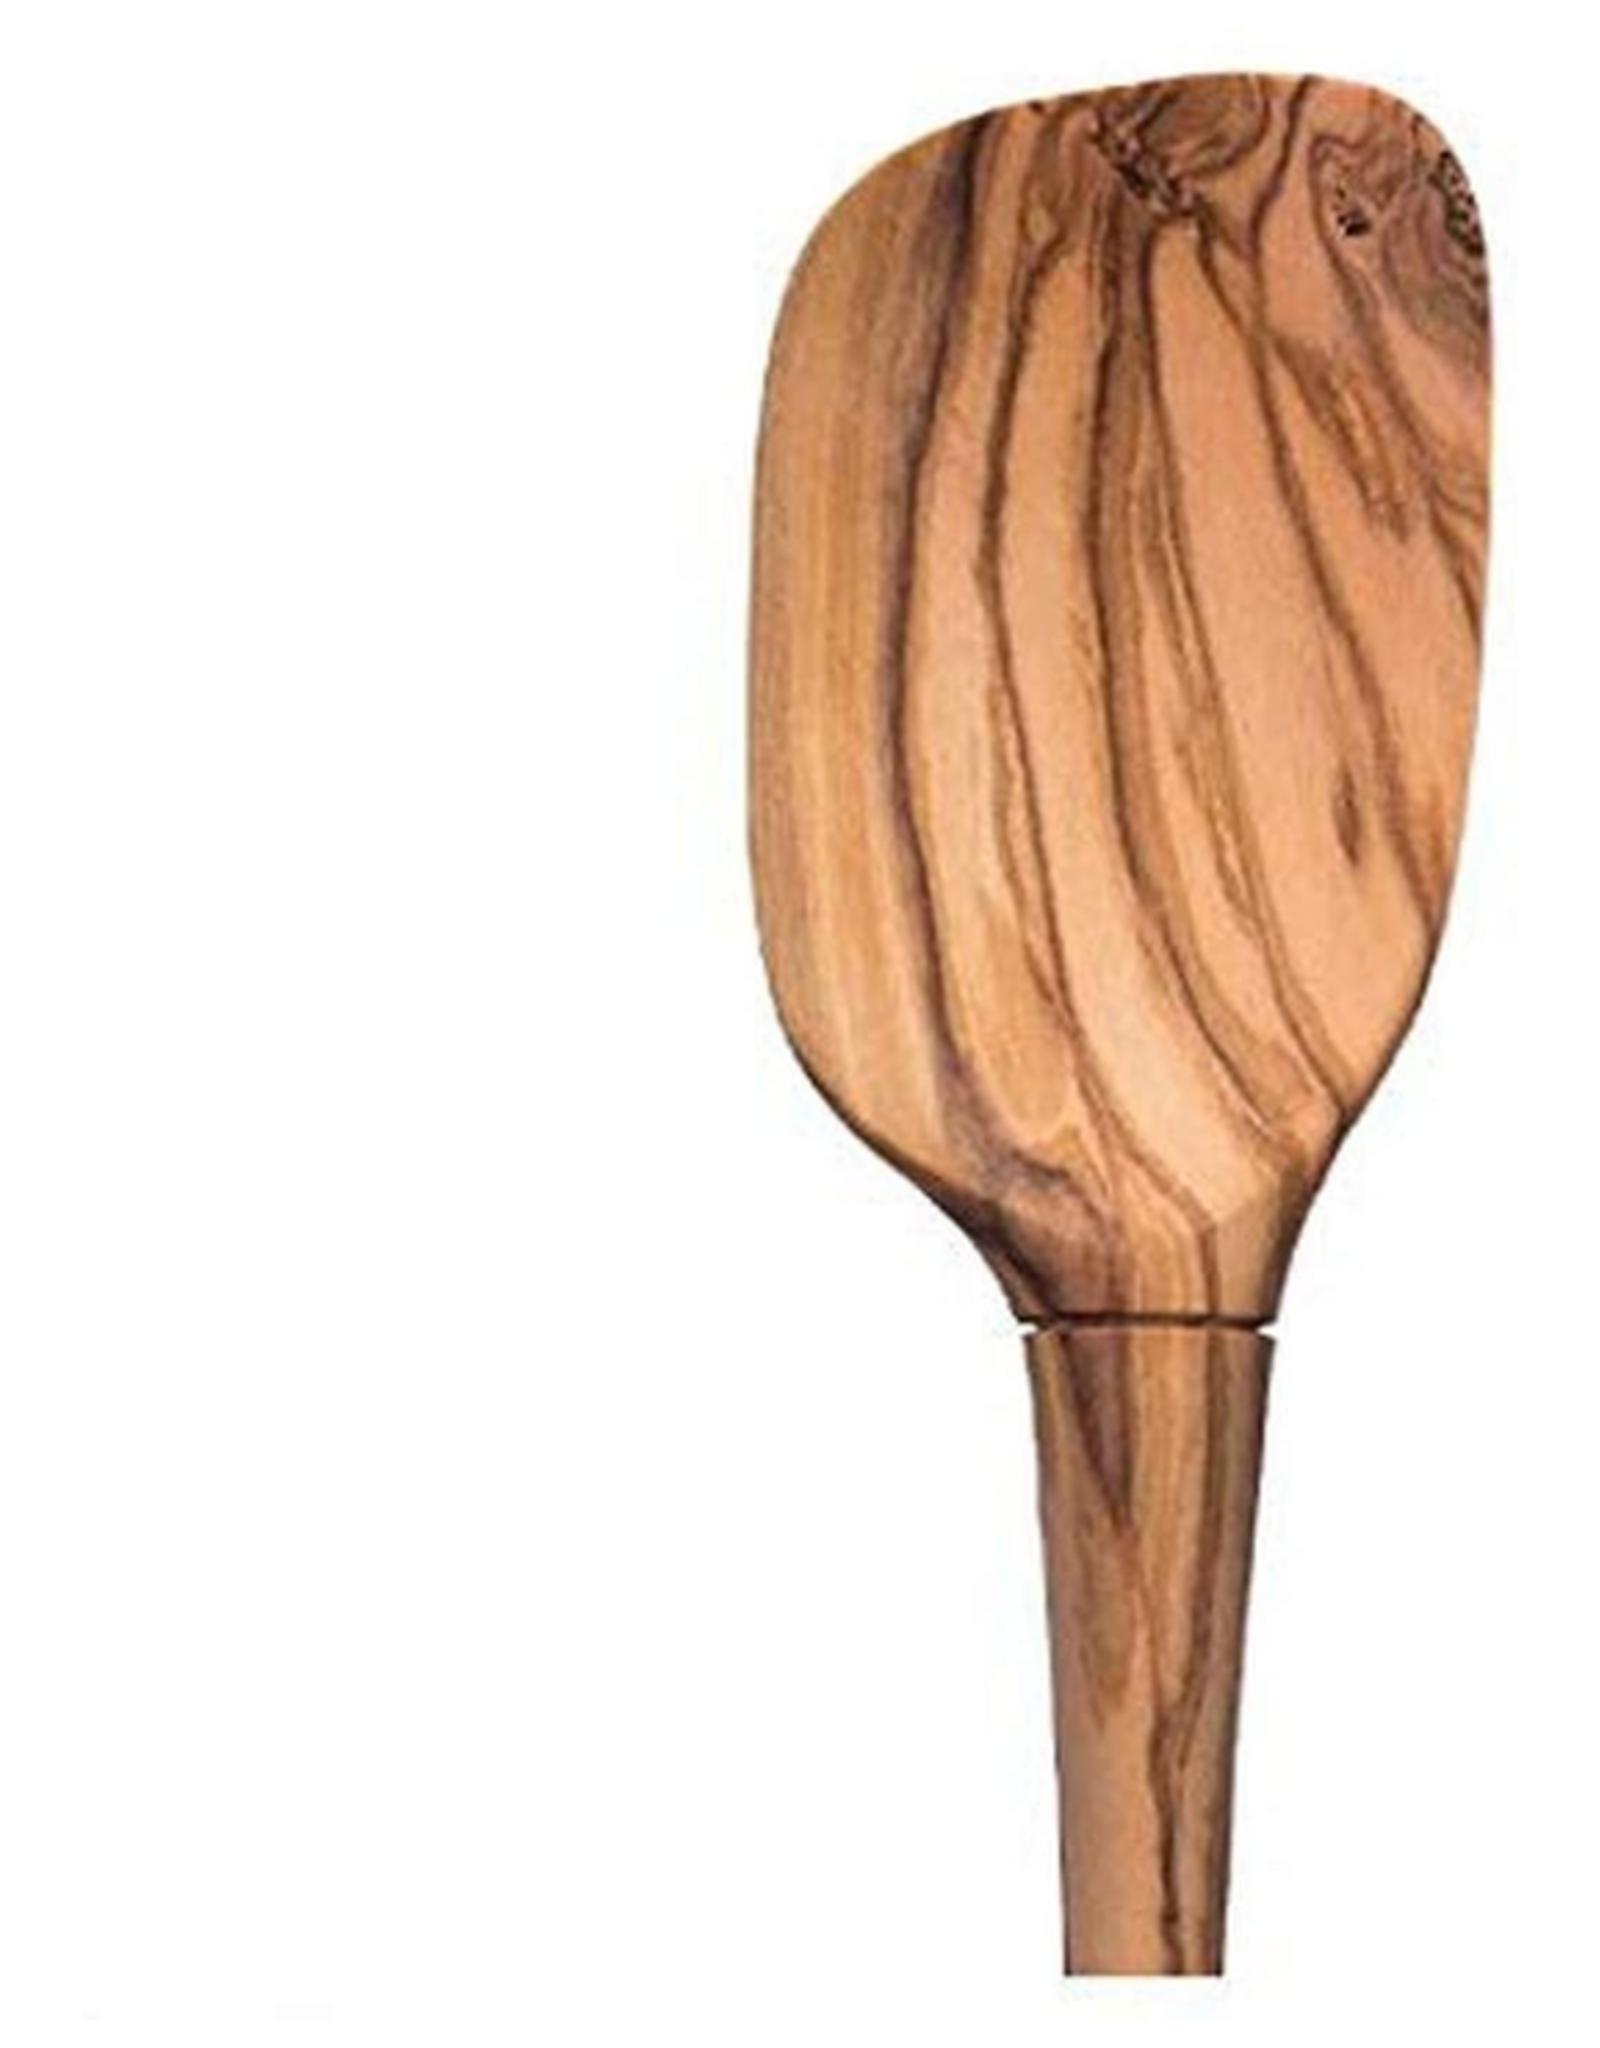 Tovolo Olivewood Spoonula